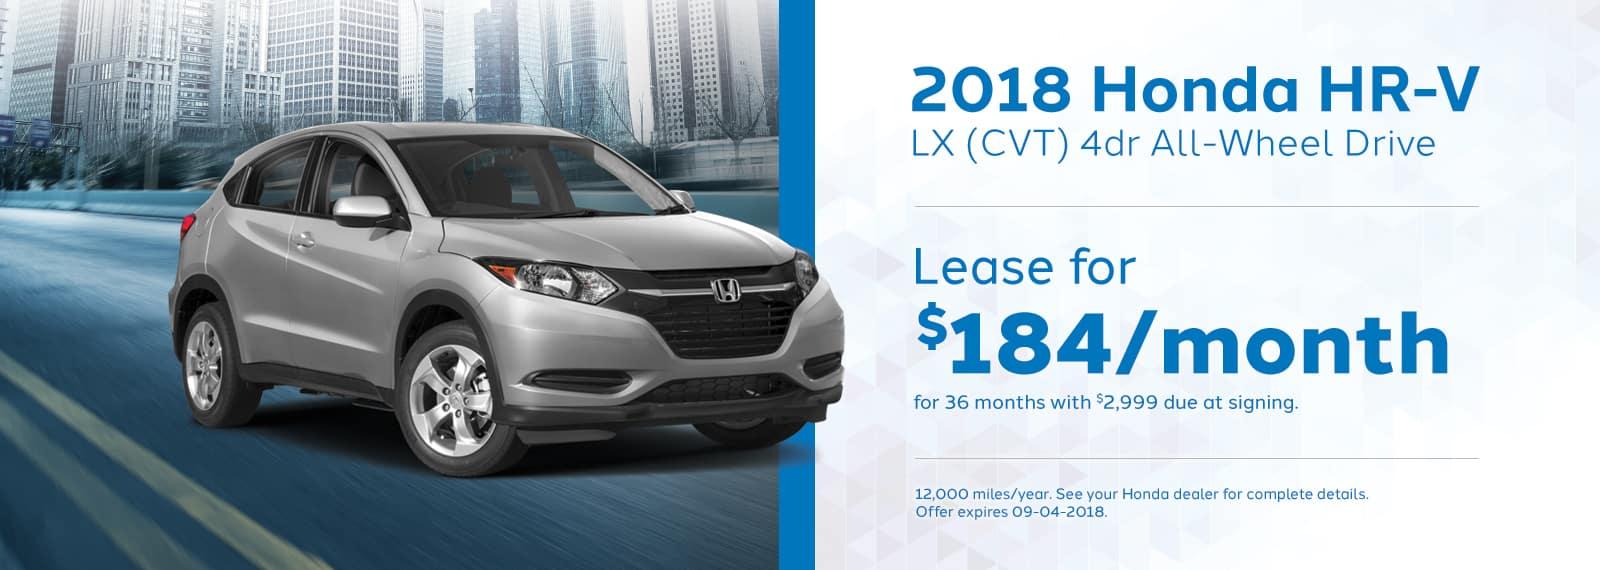 HRV Genthe Honda Lease special 2018-Honda-HR-V-LX